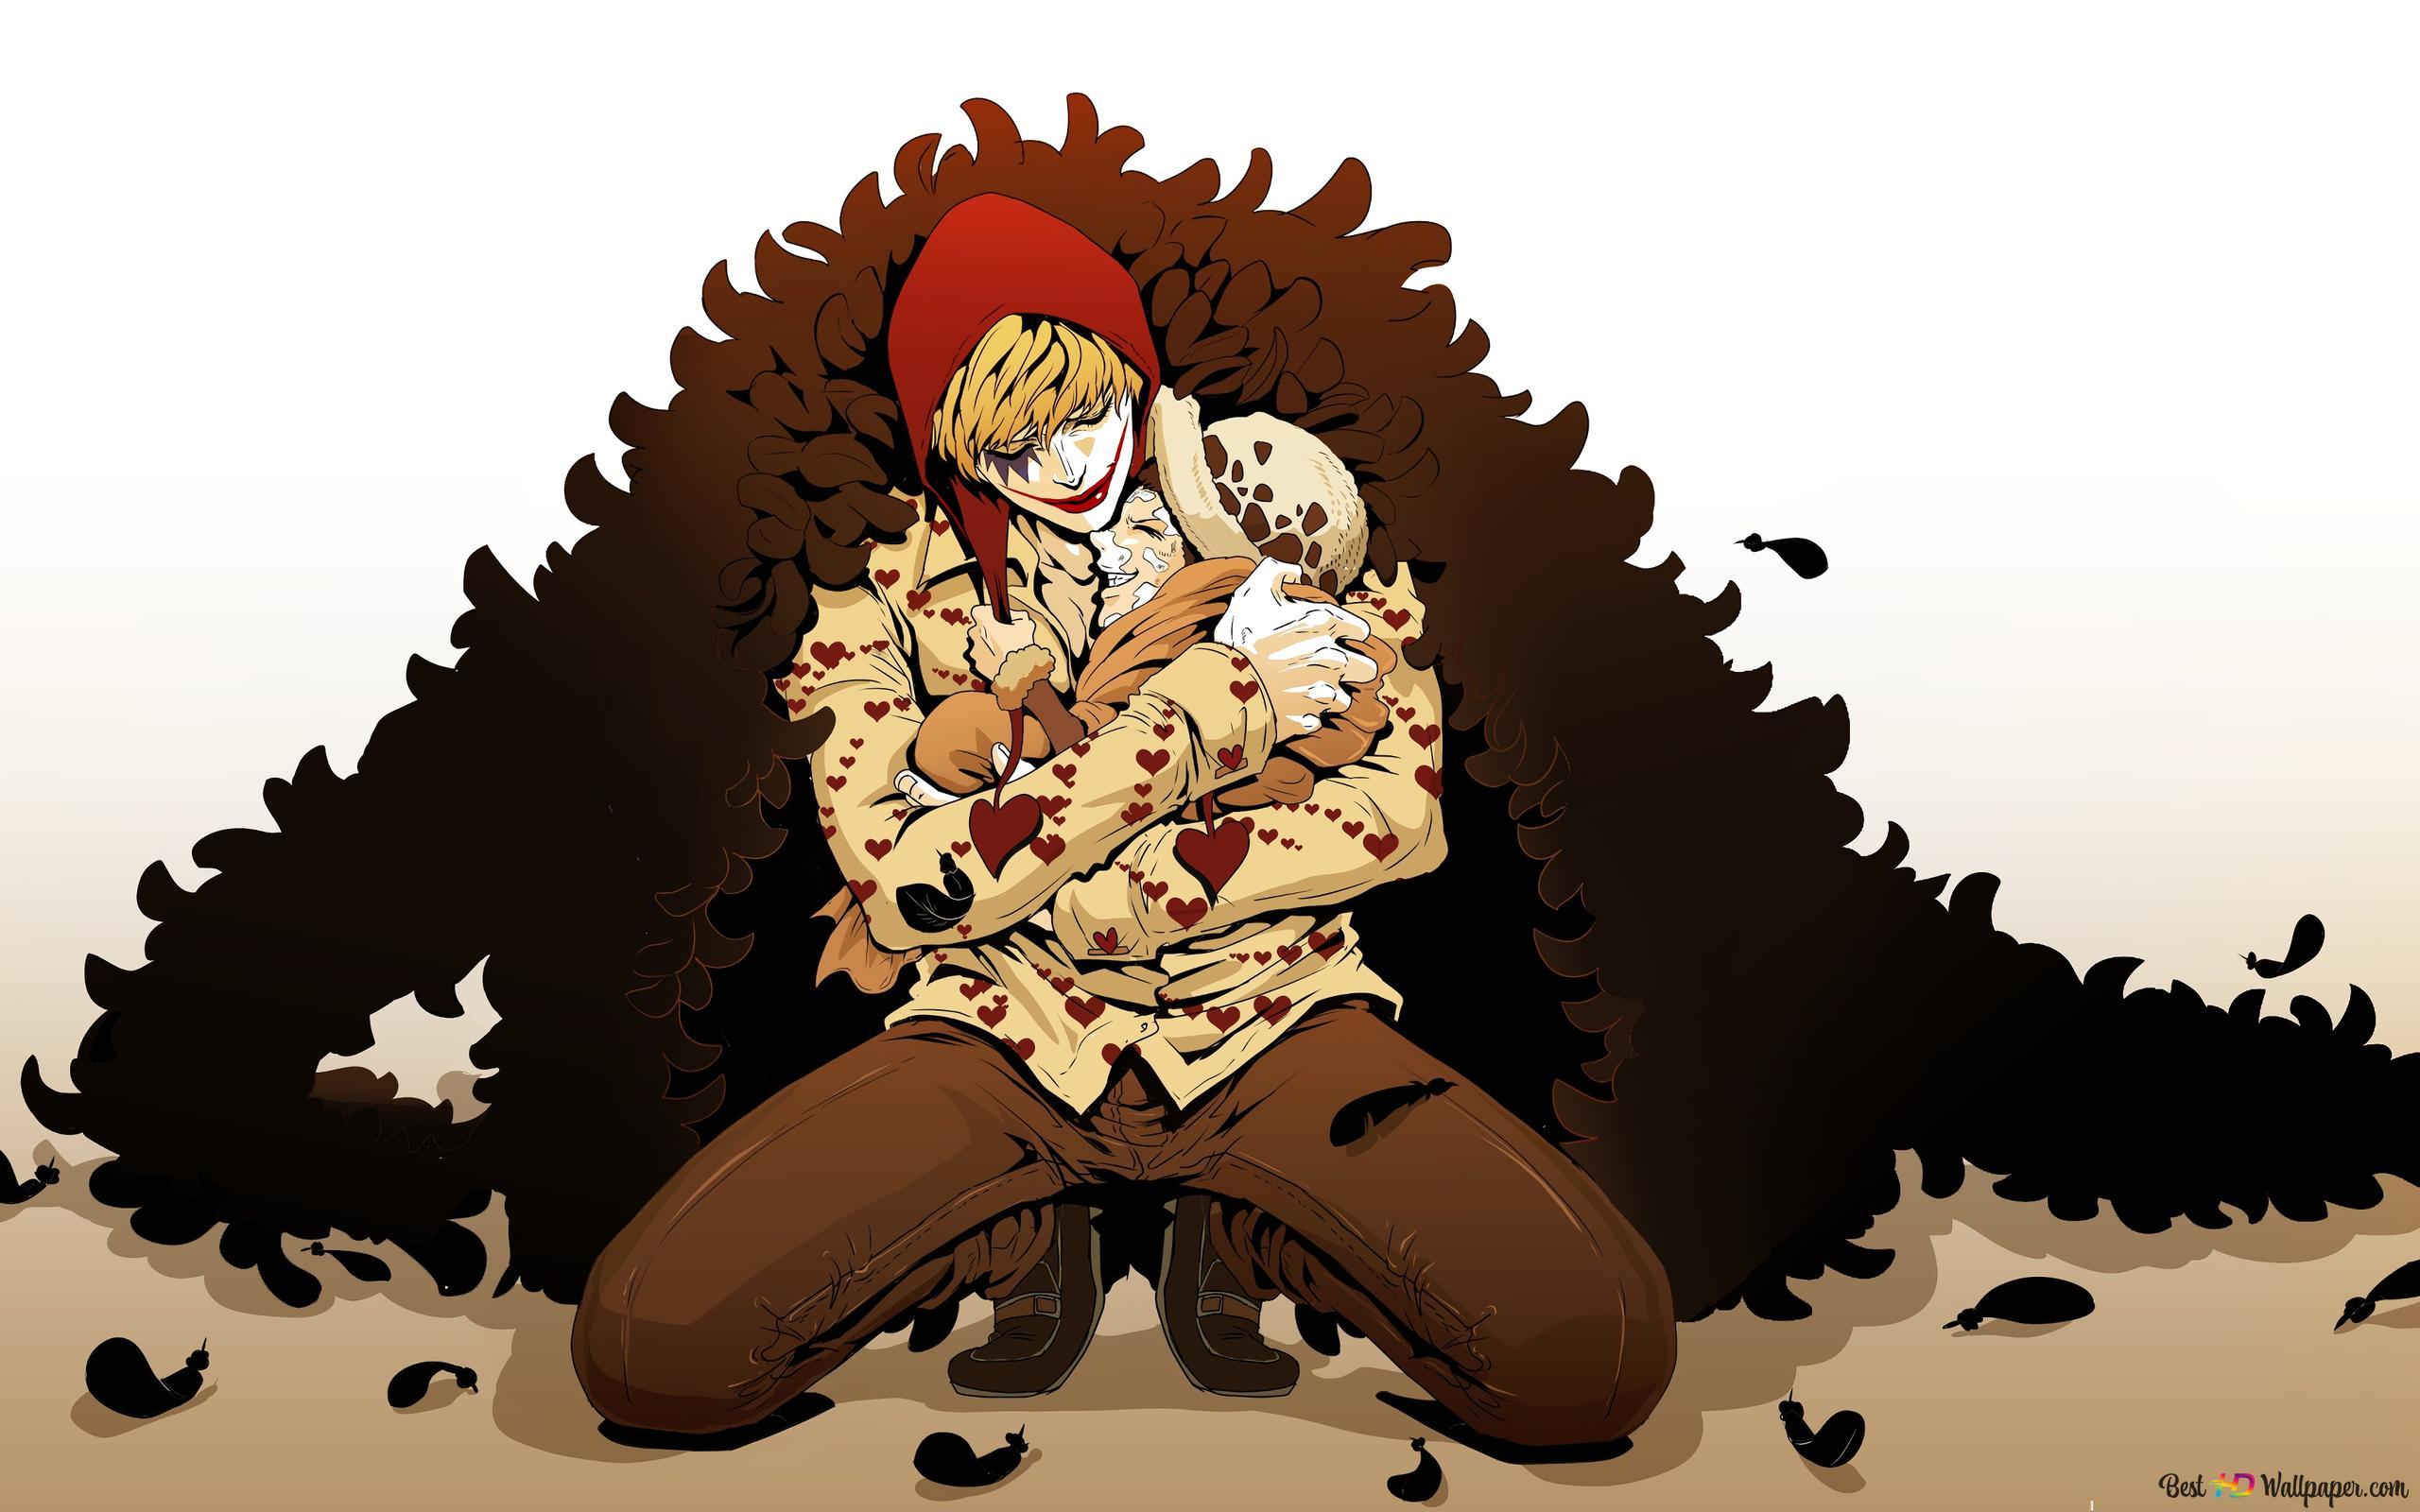 One Piece Corazon Doflamingo Trafalgar Law Hd Wallpaper Download